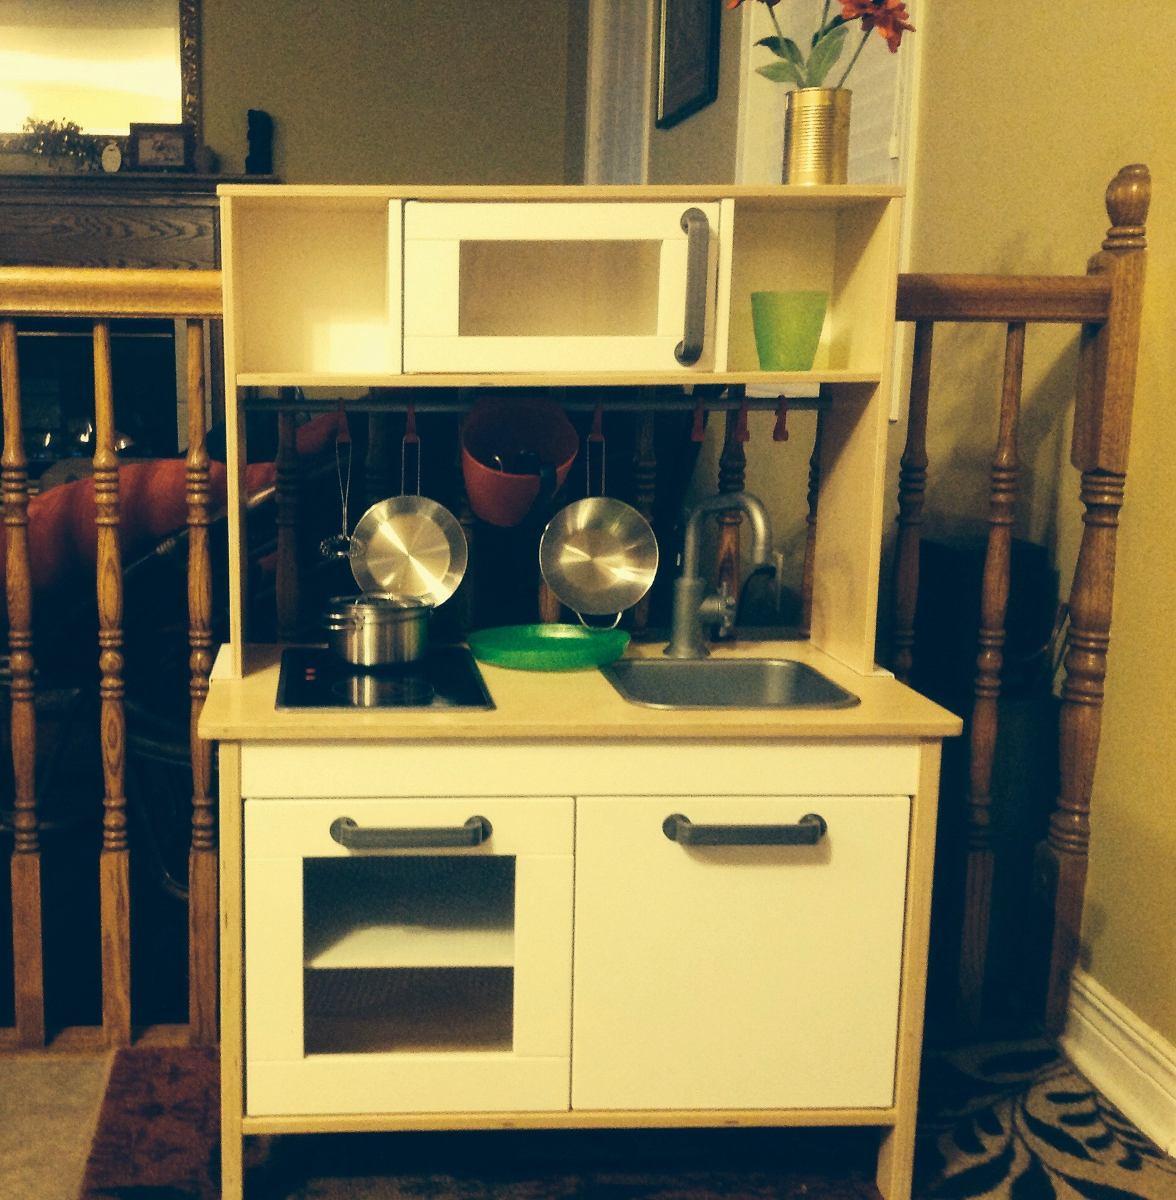 Mueble Tipo Ikea Duktig Mini Cocina 5 499 00 En Mercado Libre # Muebles Tipo Ikea